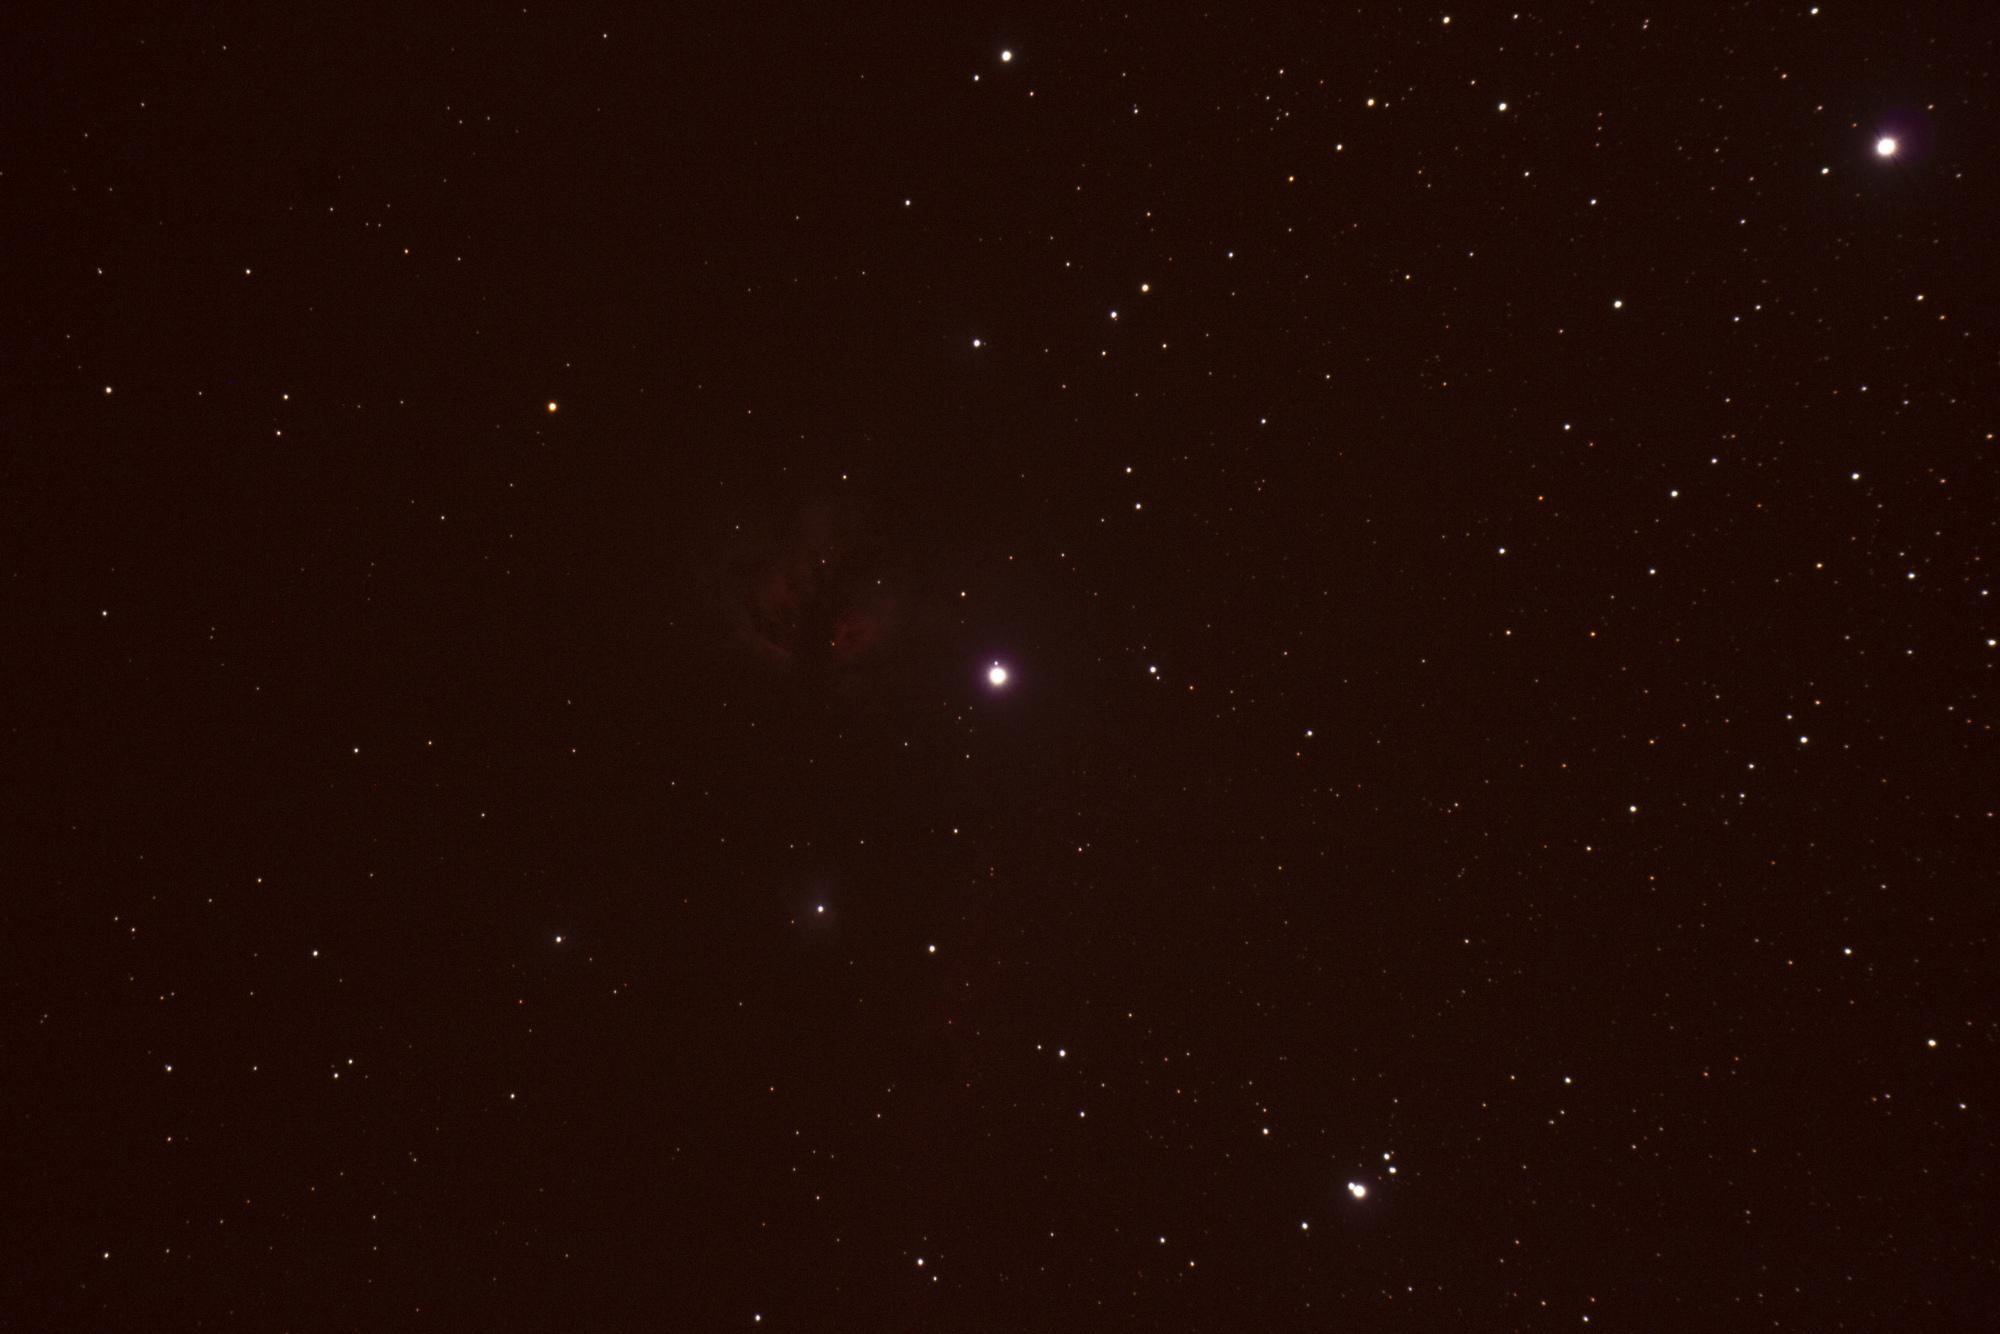 Light_B33_EOS_100D_2021-03-06_21-09-38_ISO400_60s_T-2C_0018_astrosurf.thumb.jpg.dcb169c0533db75fceaa1058192740bf.jpg